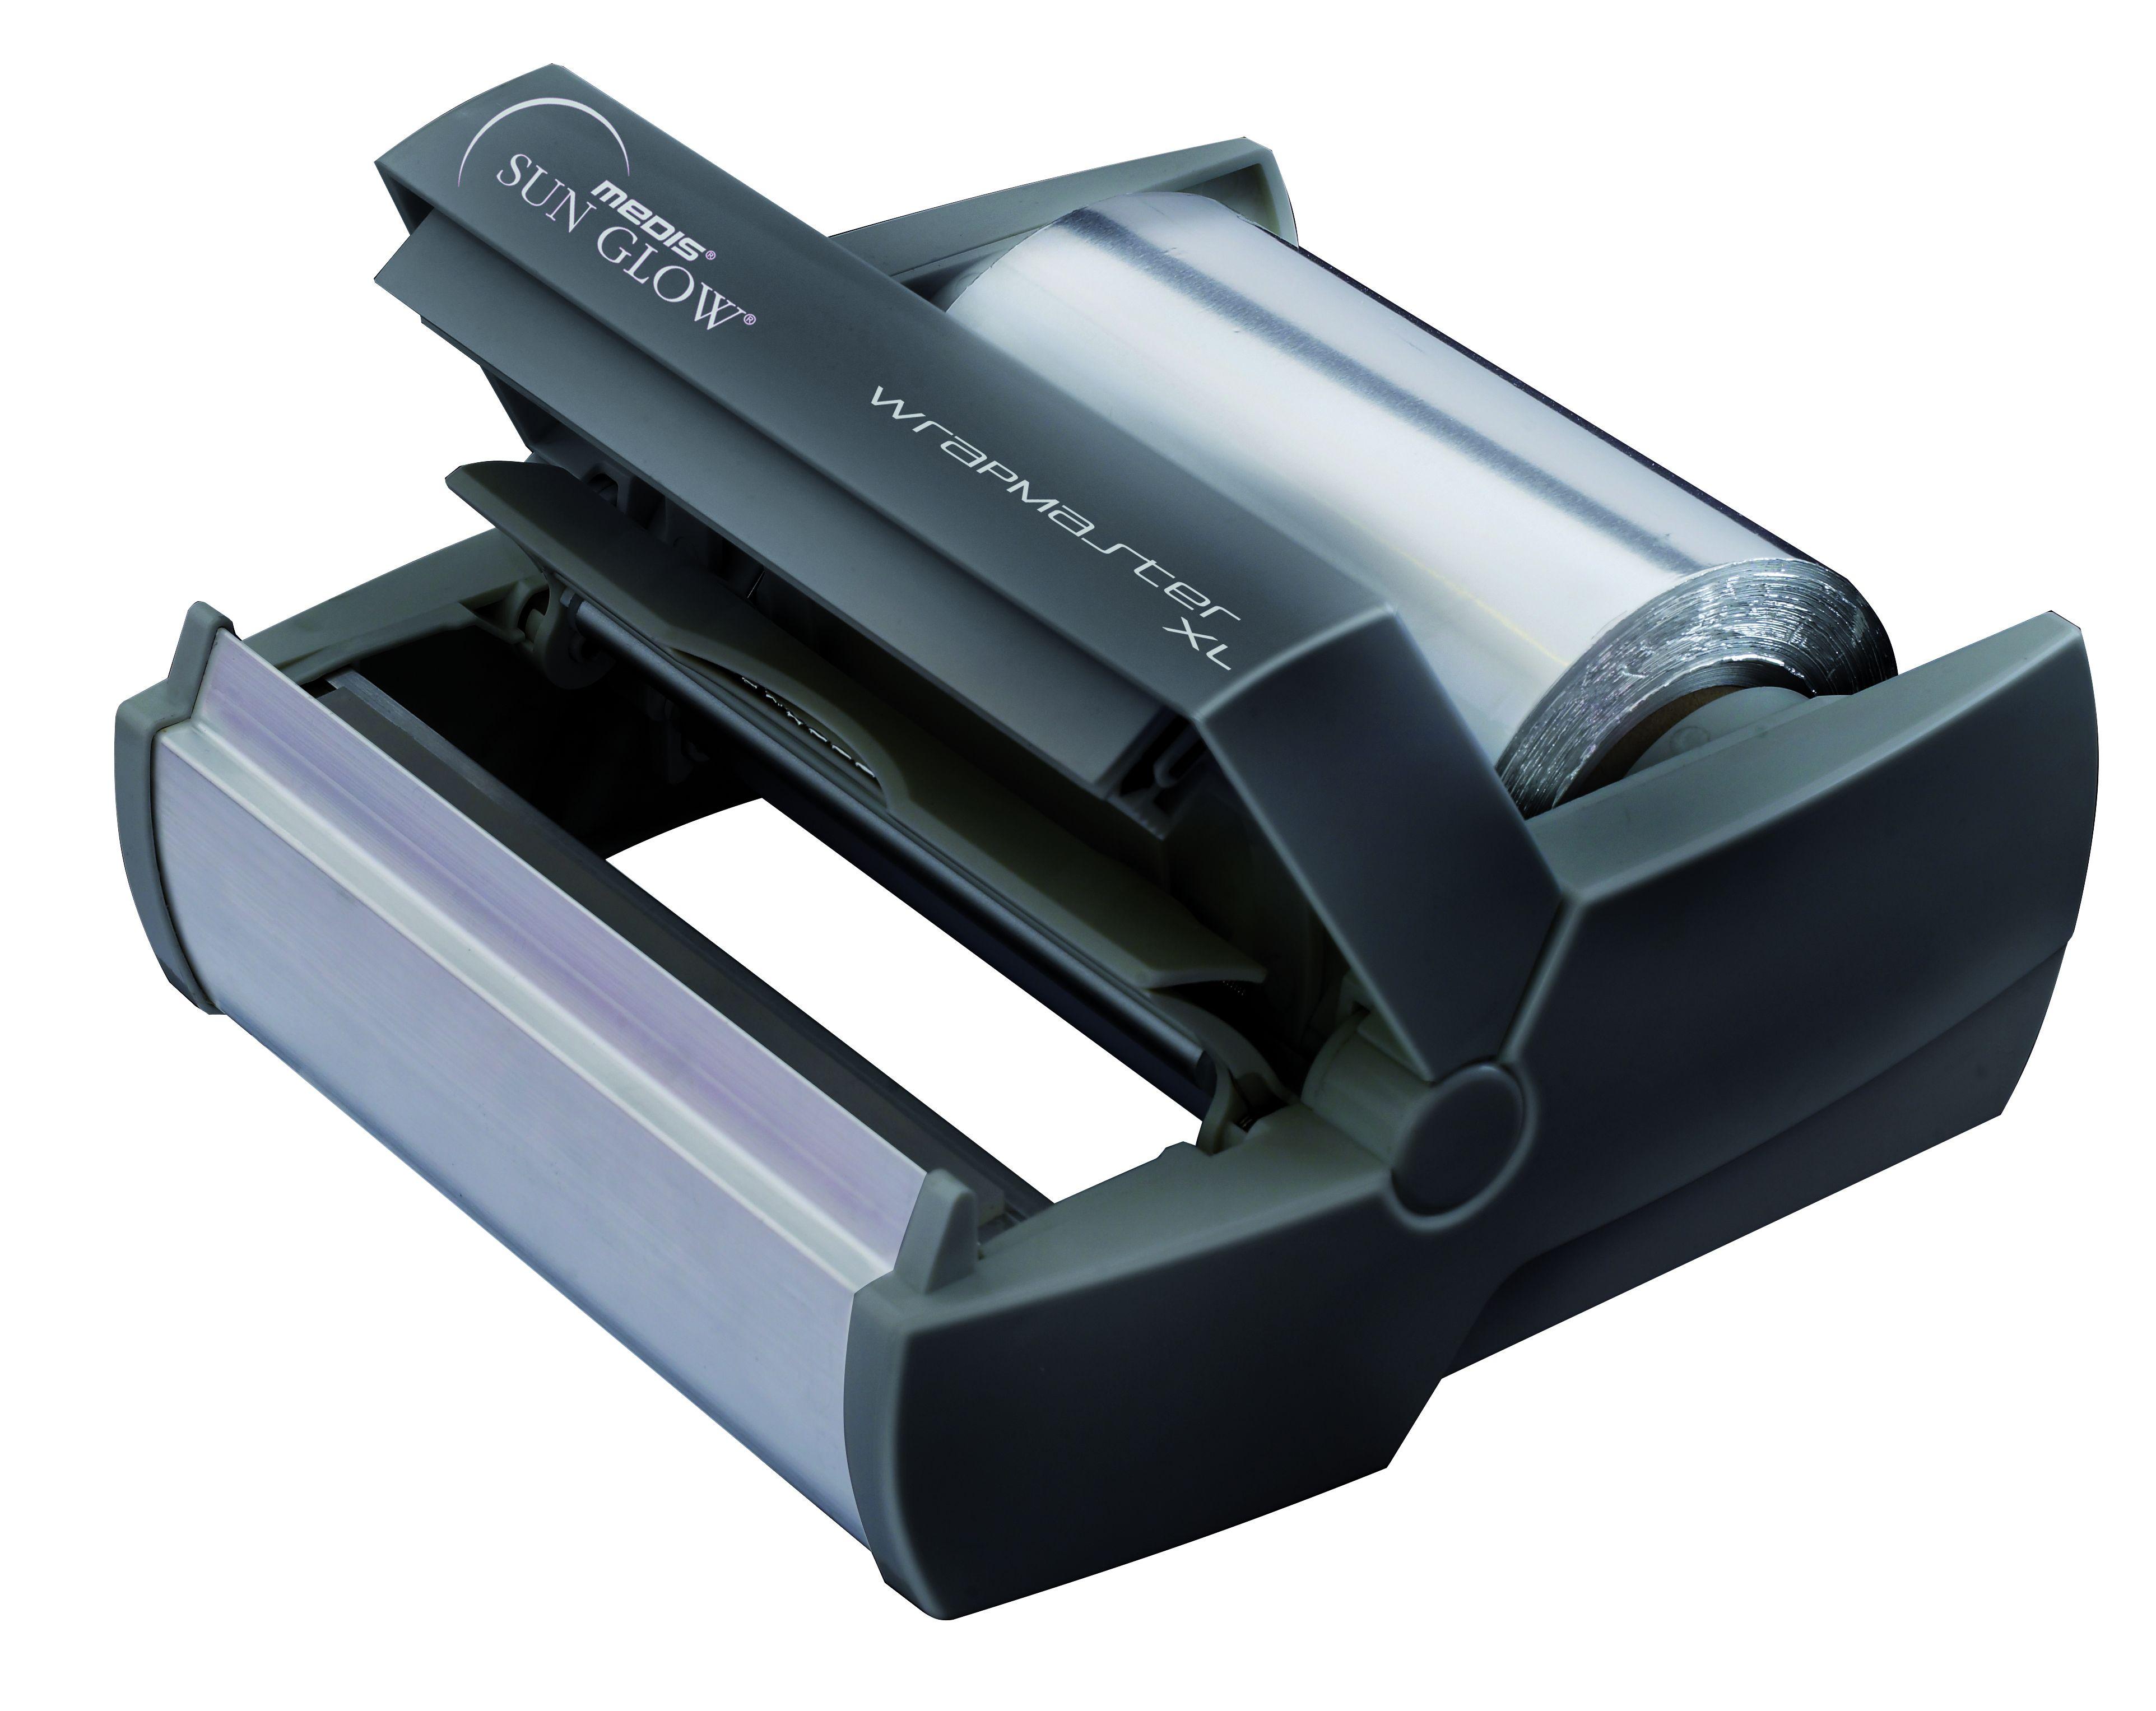 Folien-Dispenser Wrapmaster XL